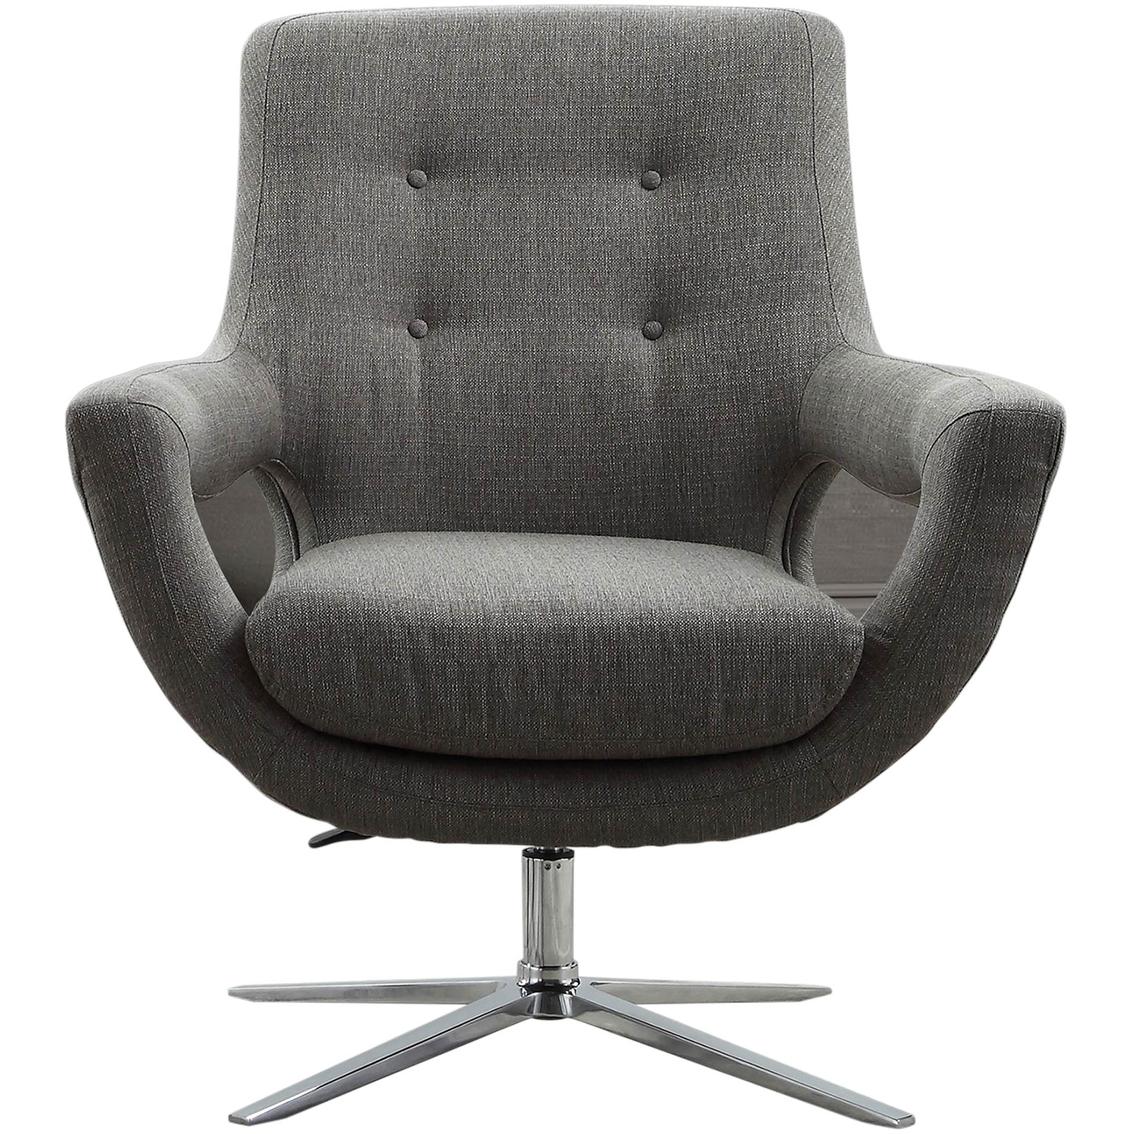 Astounding Armen Living Quinn Adjustable Swivel Chair Chairs Cjindustries Chair Design For Home Cjindustriesco